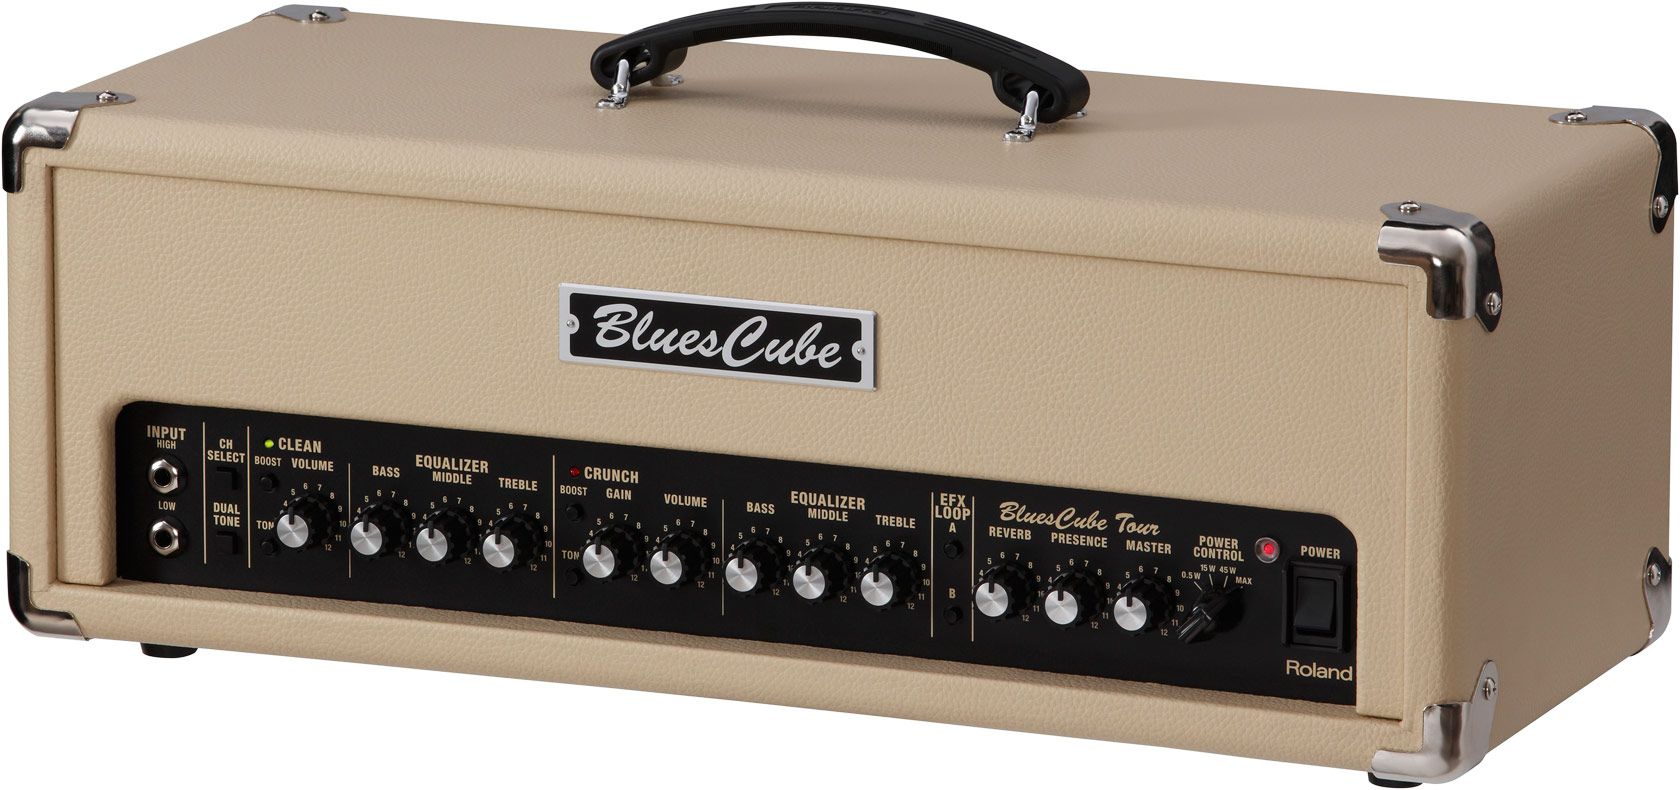 Roland India Blues Cube Tour Guitar Amplifier Amp Input Jack Wiring